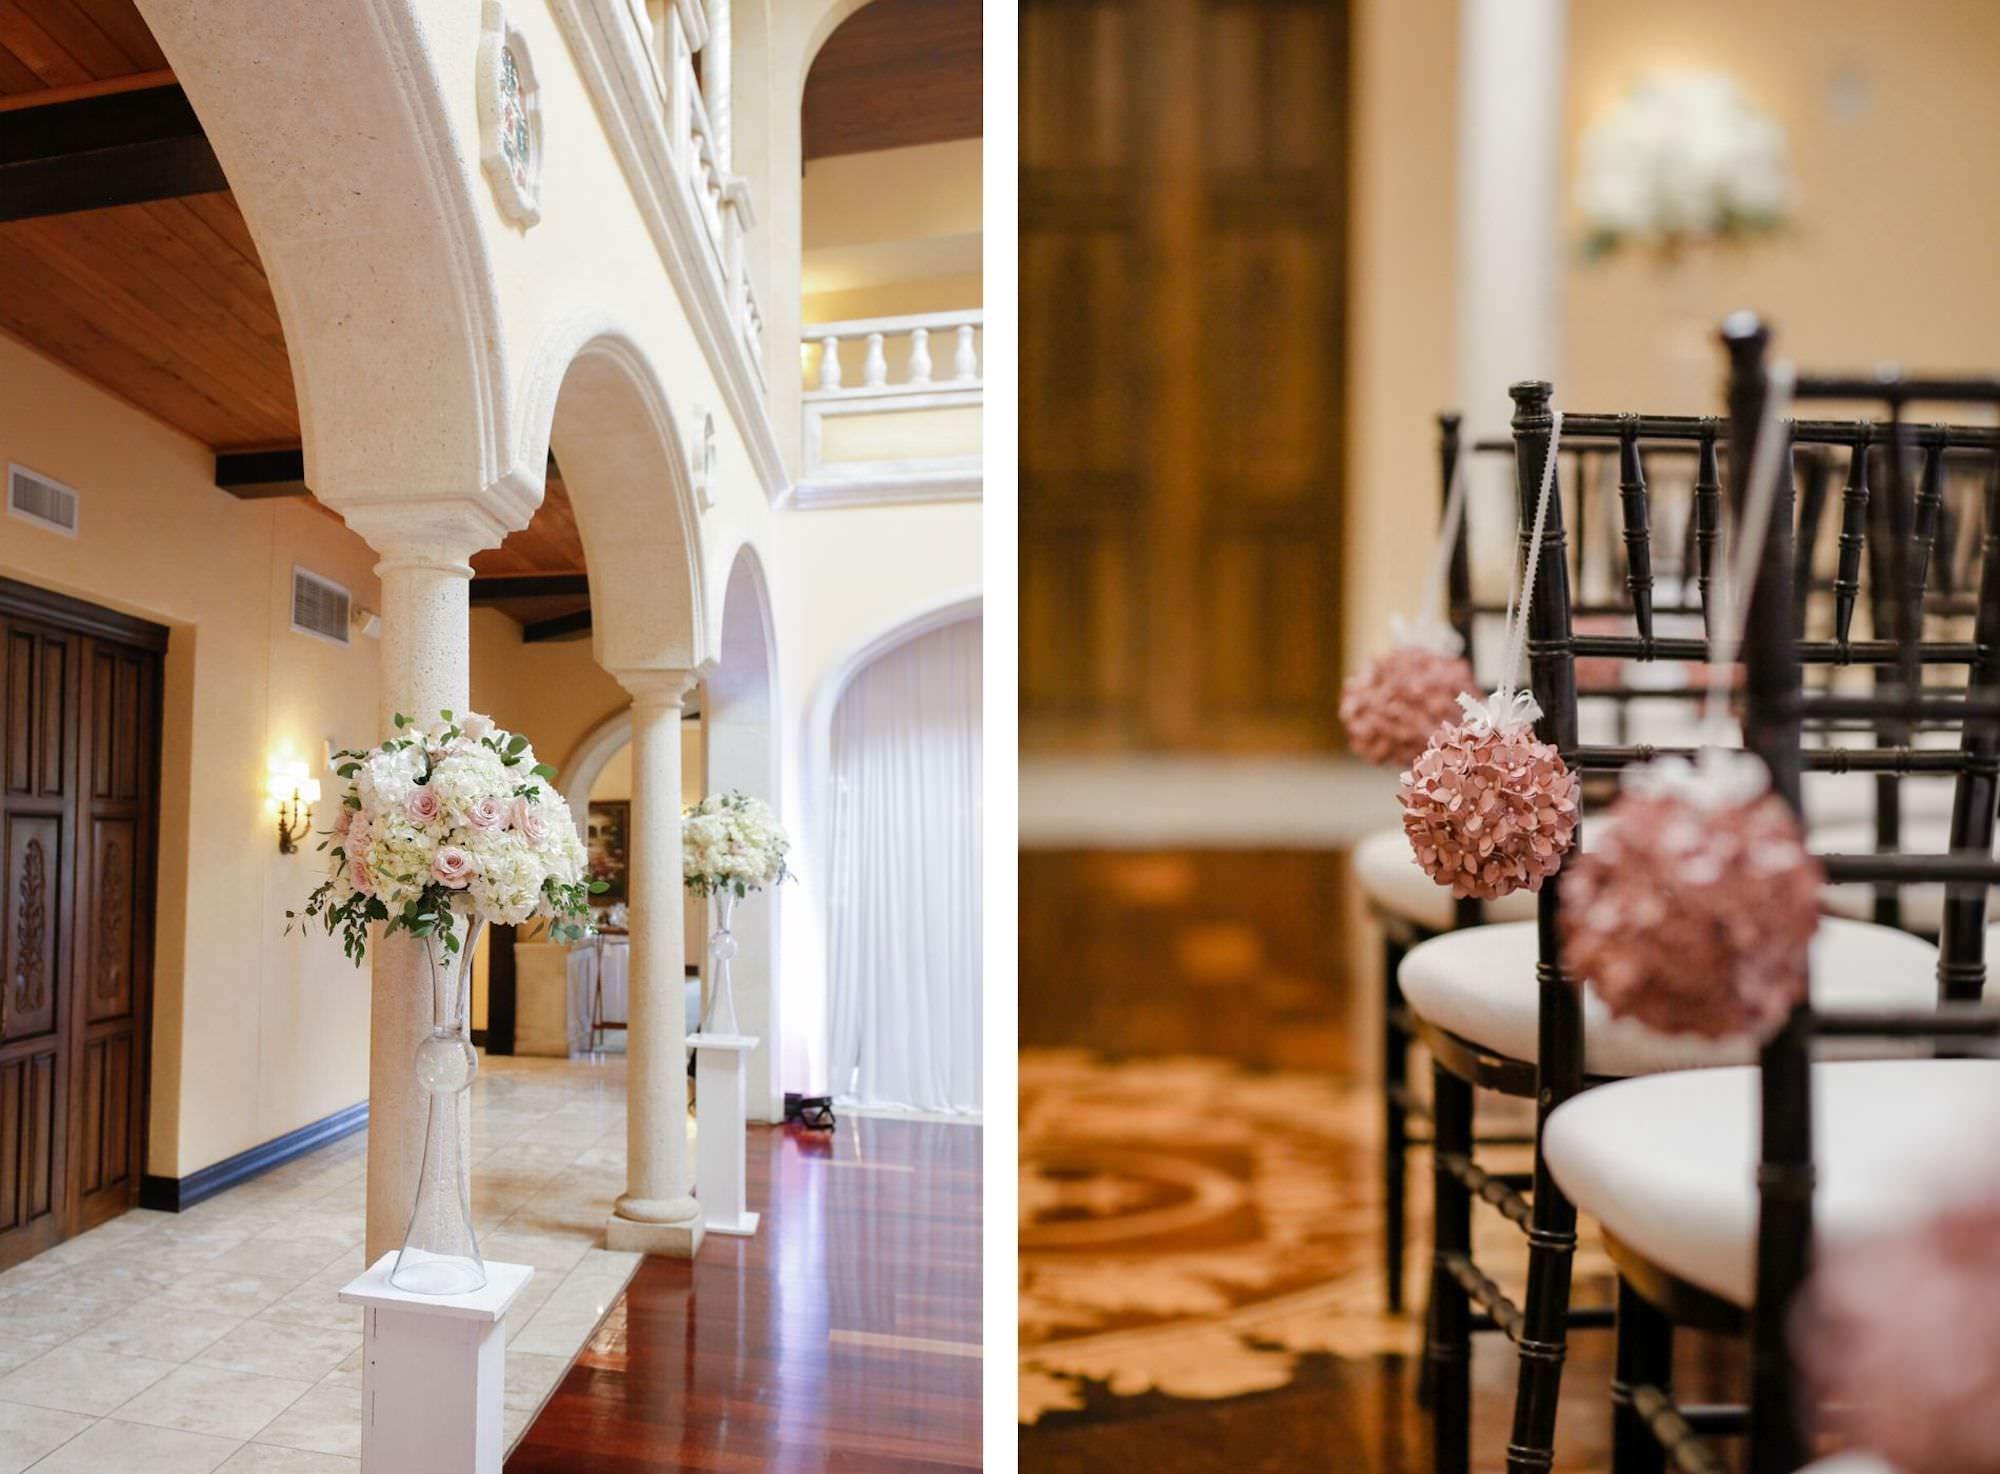 Indoor Ballroom Wedding Ceremony with Black Chiavari Chairs and Blush Pink Dusty Rose Pomander Balls | Tall Wedding Altar Floral Arrangements | Elegant Tampa Bay Wedding Venue Avila Golf & Country Club